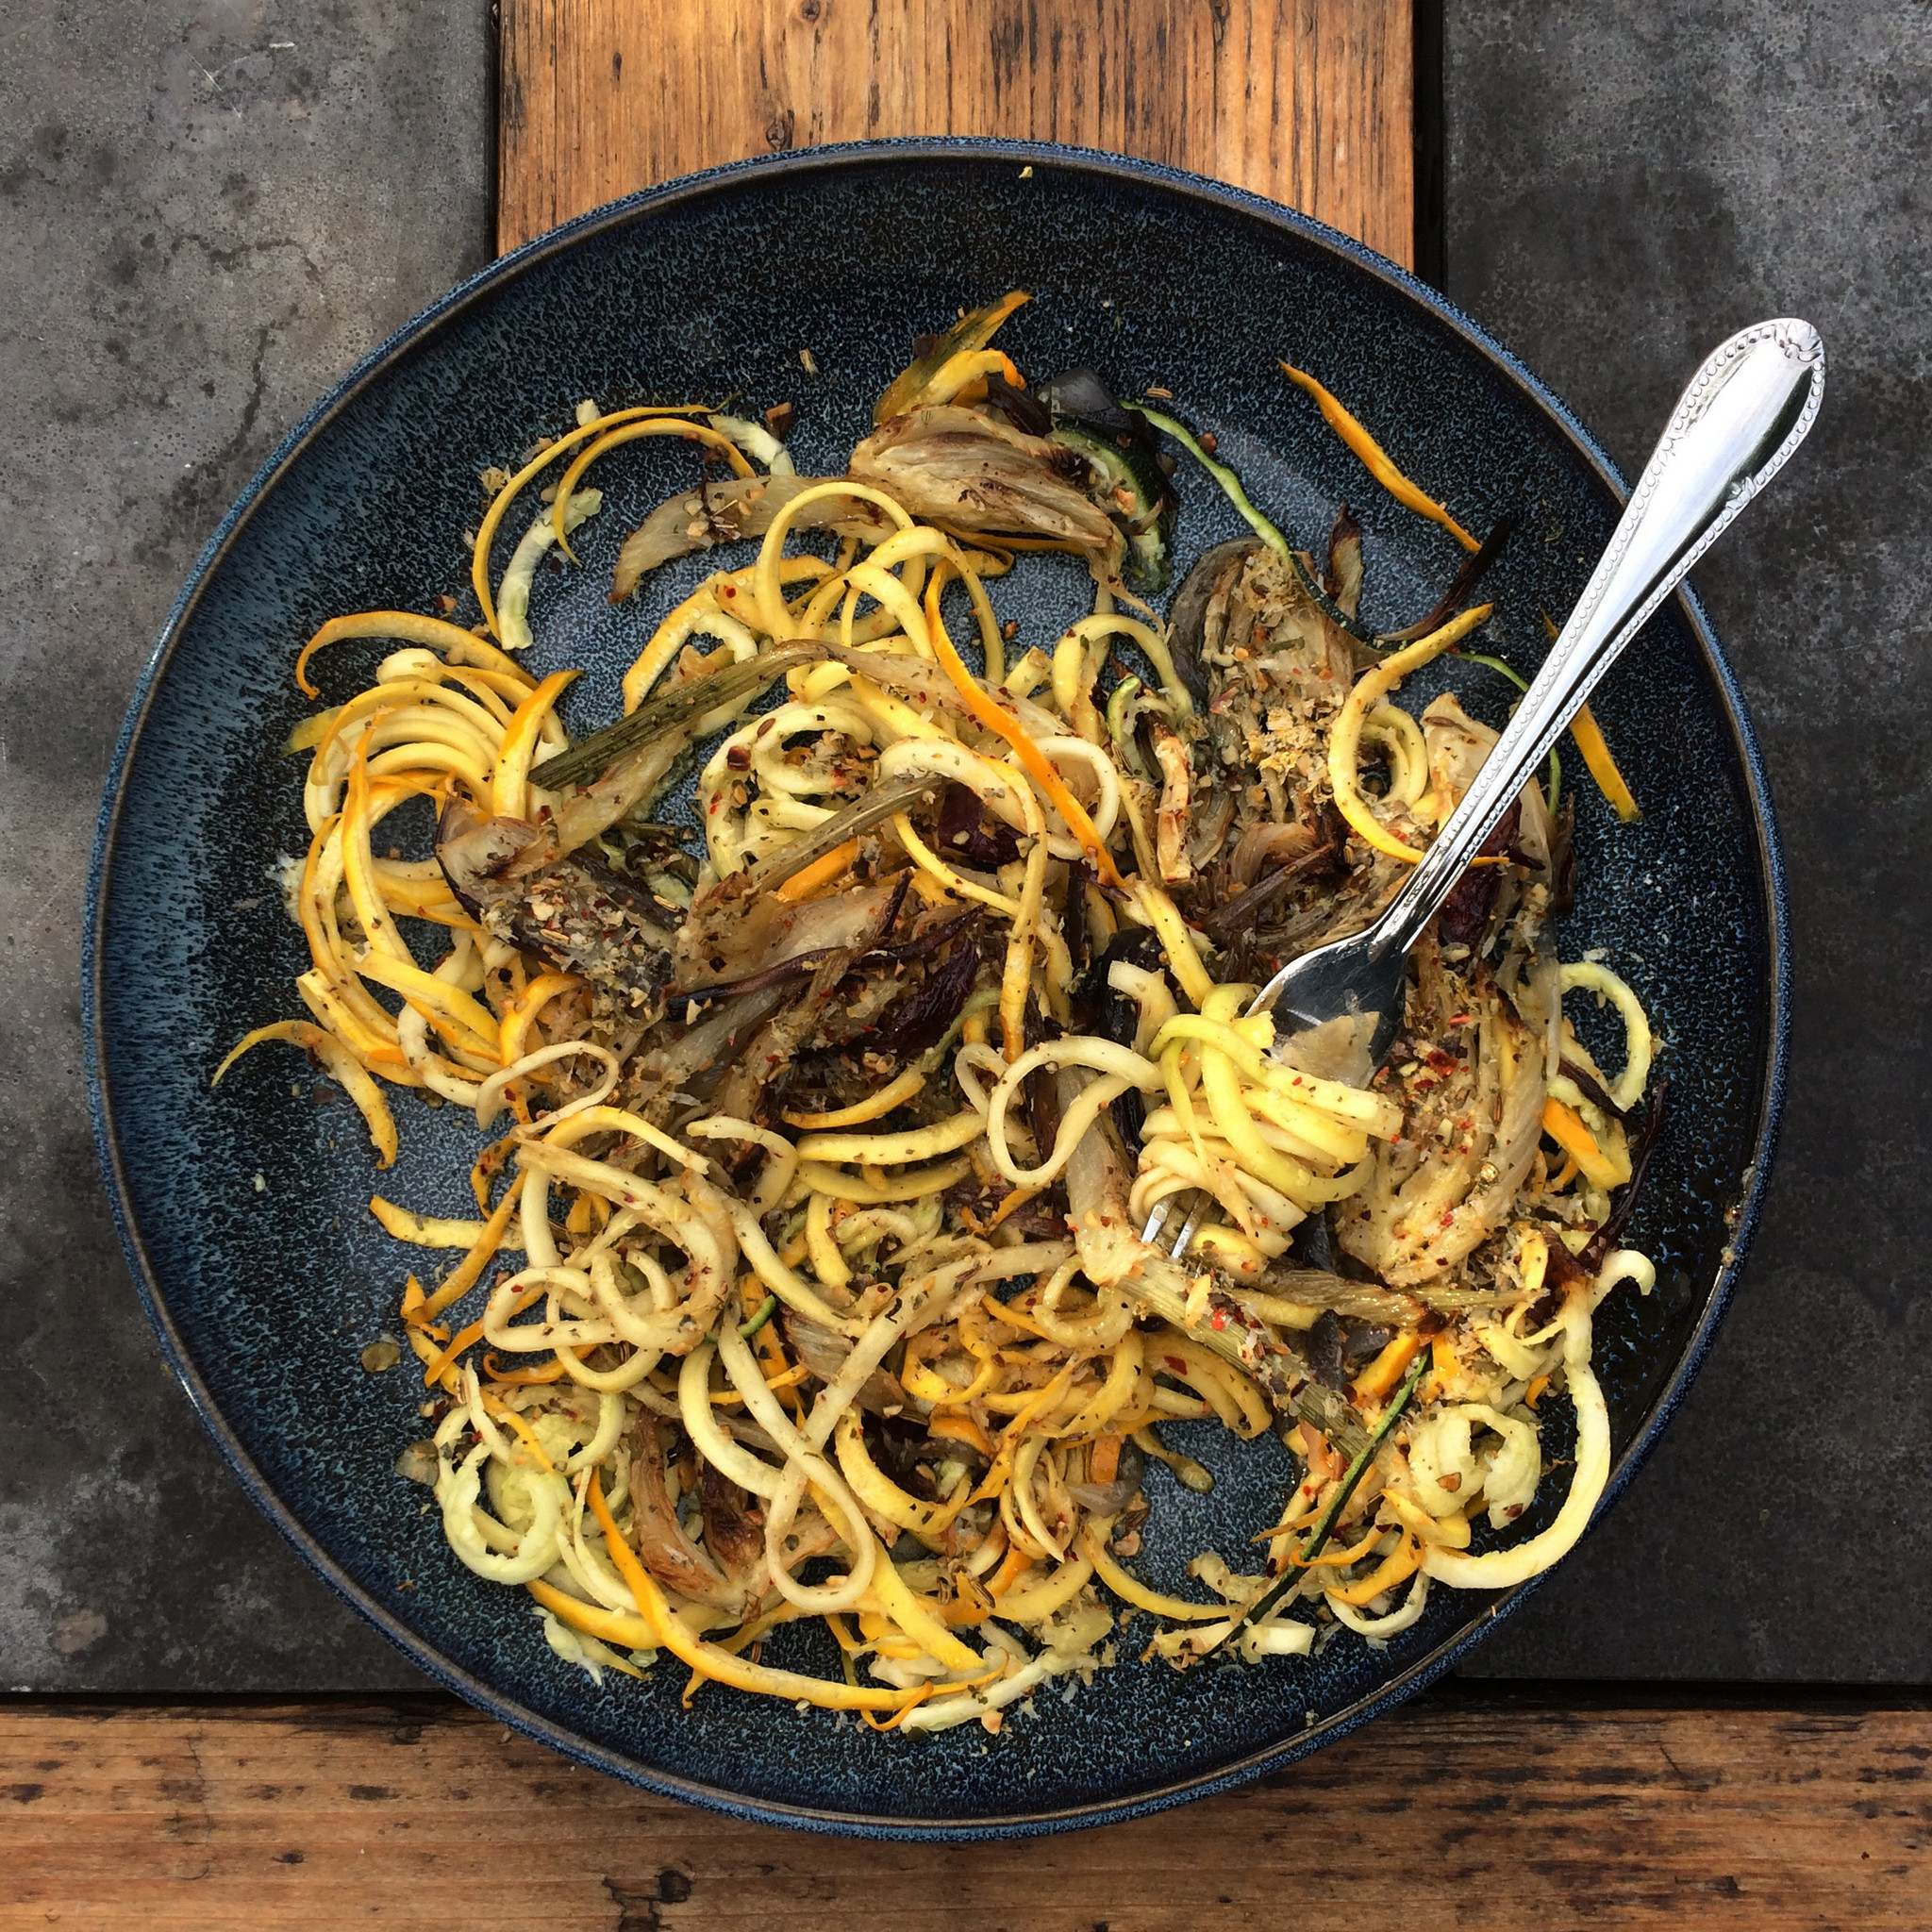 Courgette spaghetti met geroosterde venkel en pompoen